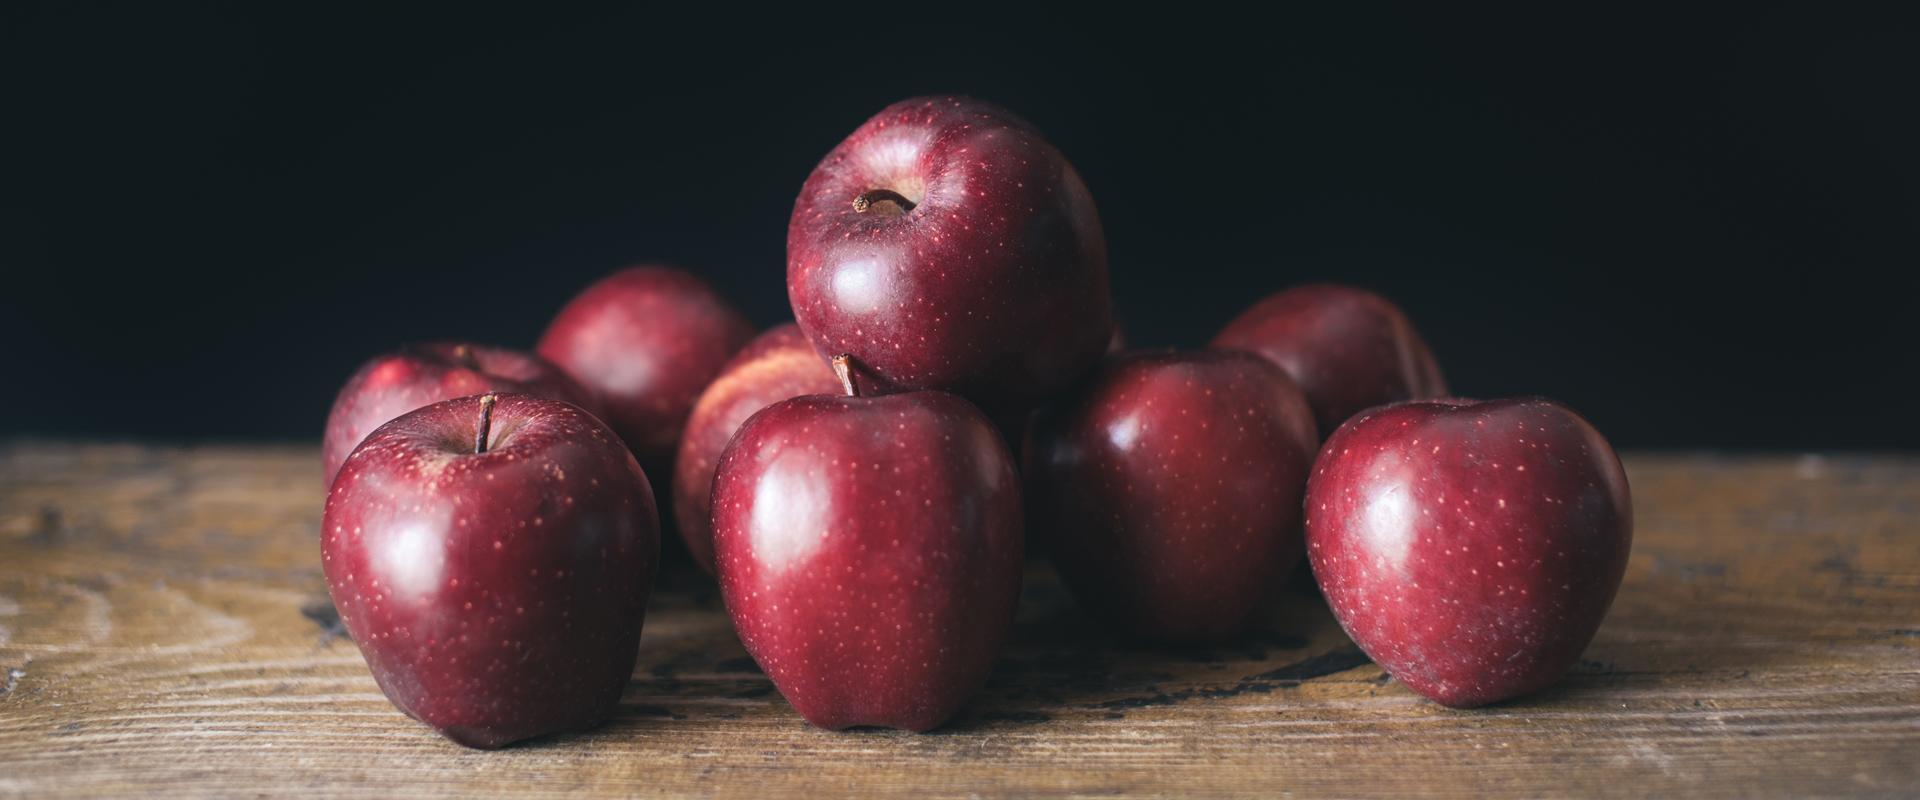 apples-1920-800